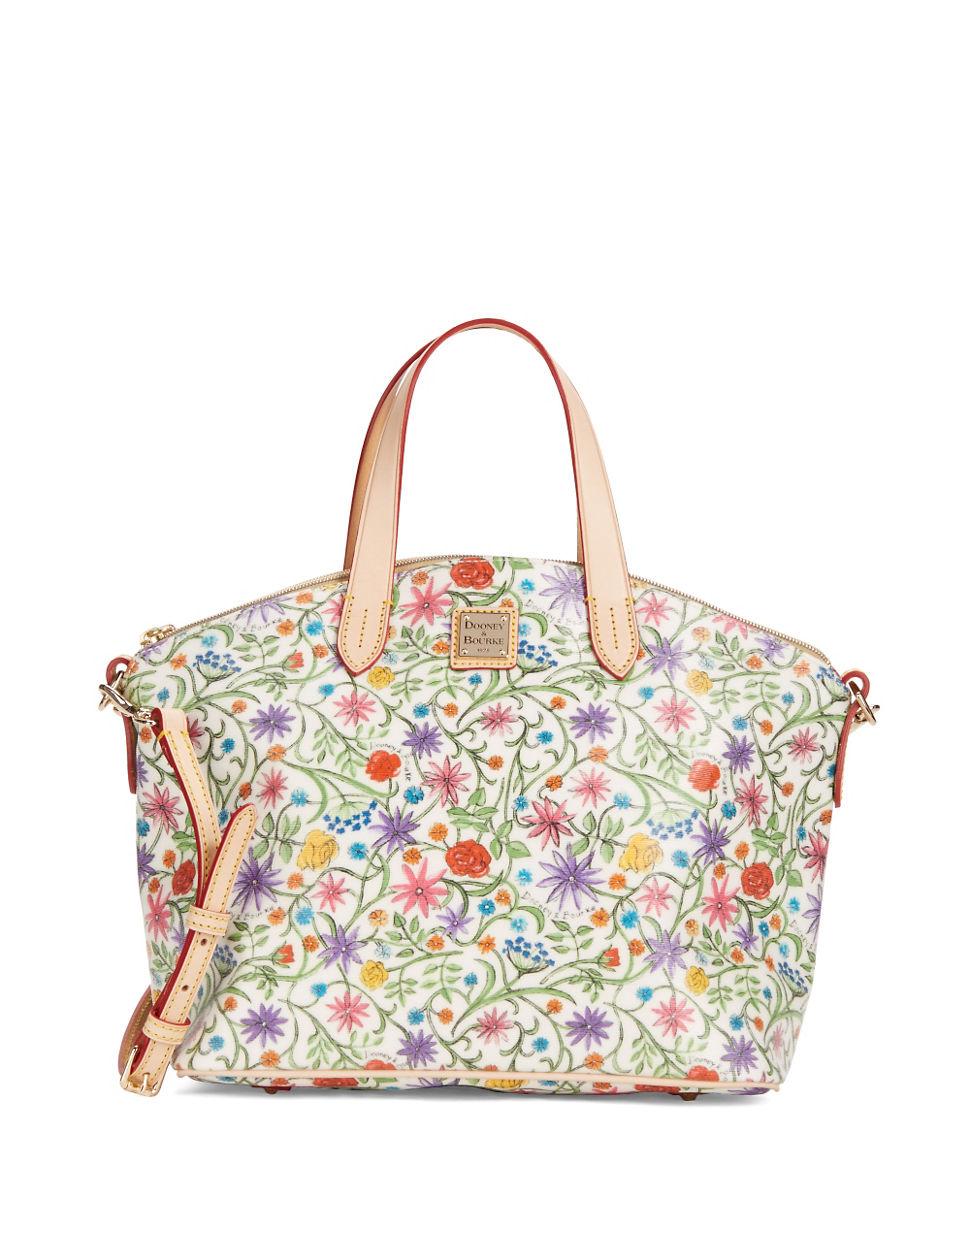 Dooney & bourke Eva Floral Satchel Bag in White | Lyst